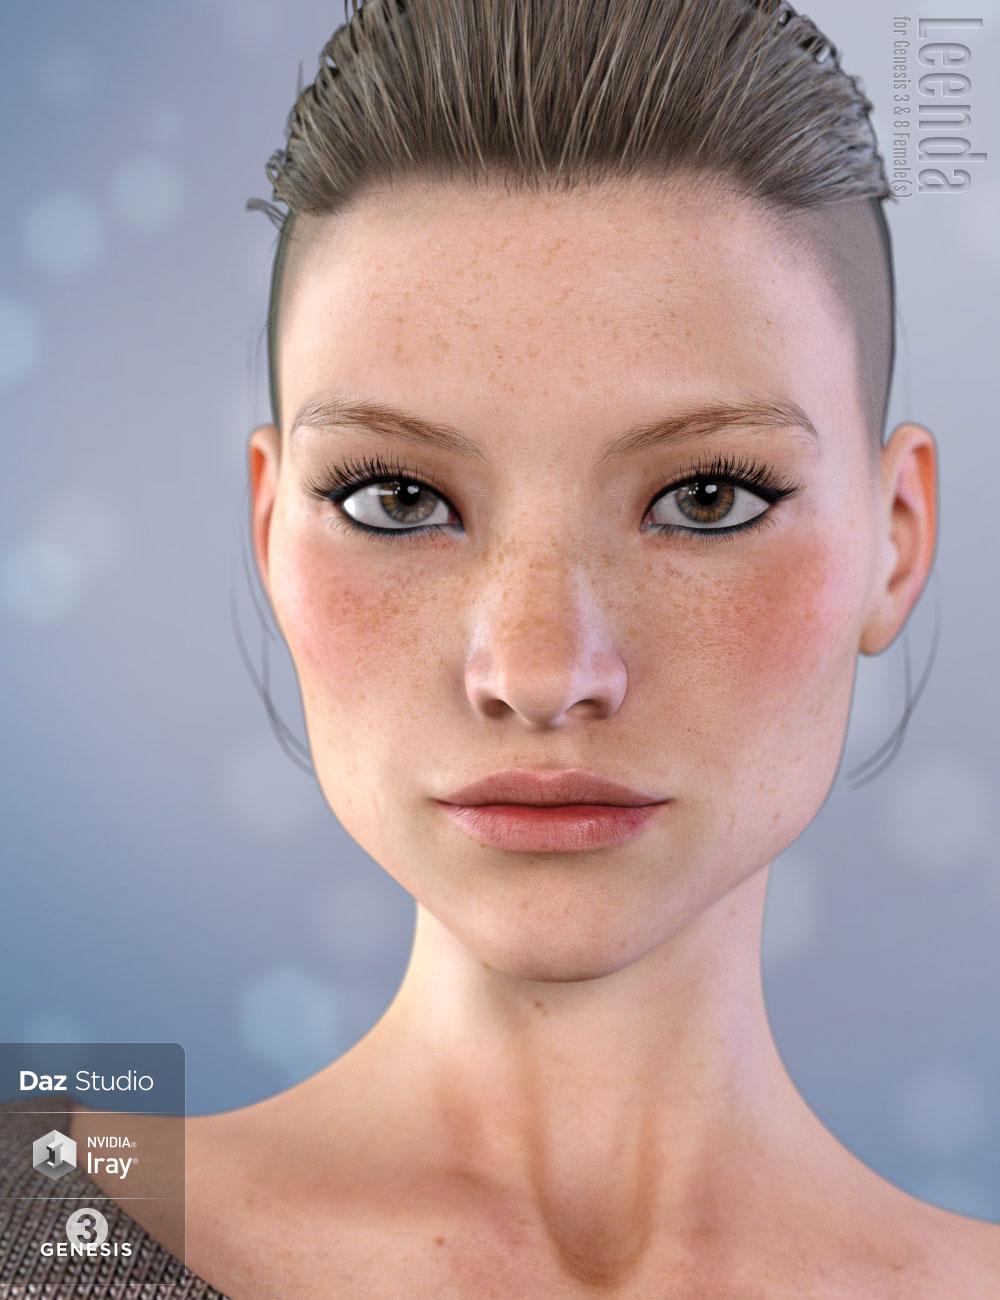 Leenda for Genesis 3 and 8 Female by: Eichhorn Art, 3D Models by Daz 3D